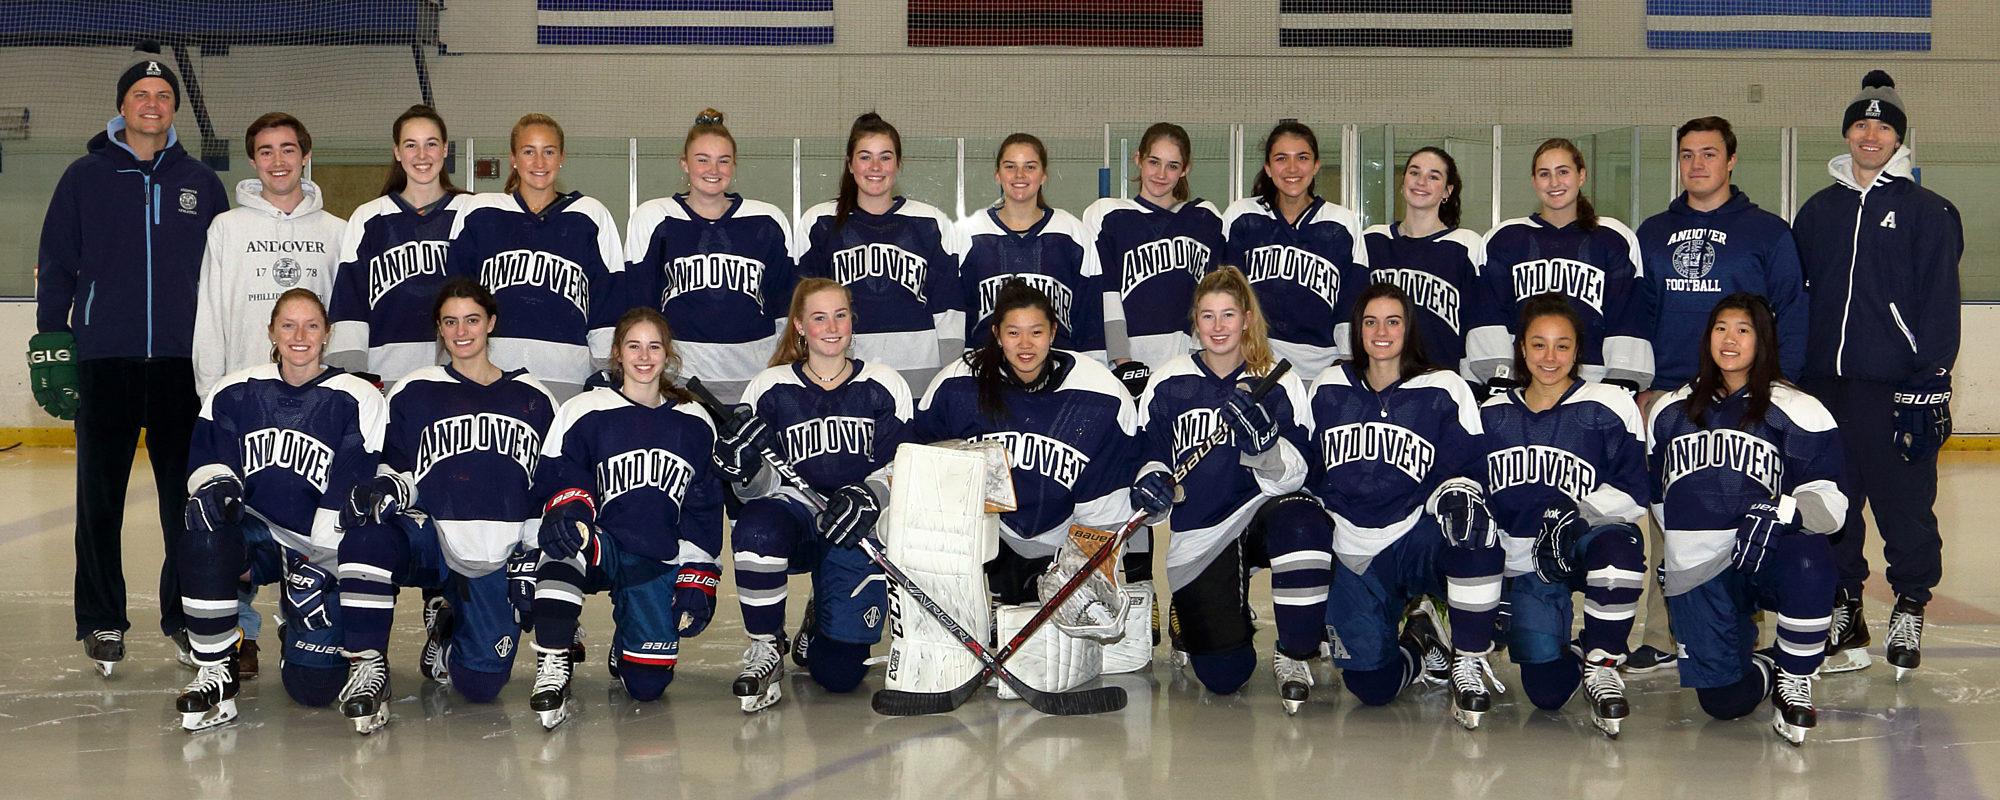 Hockey JVG 55